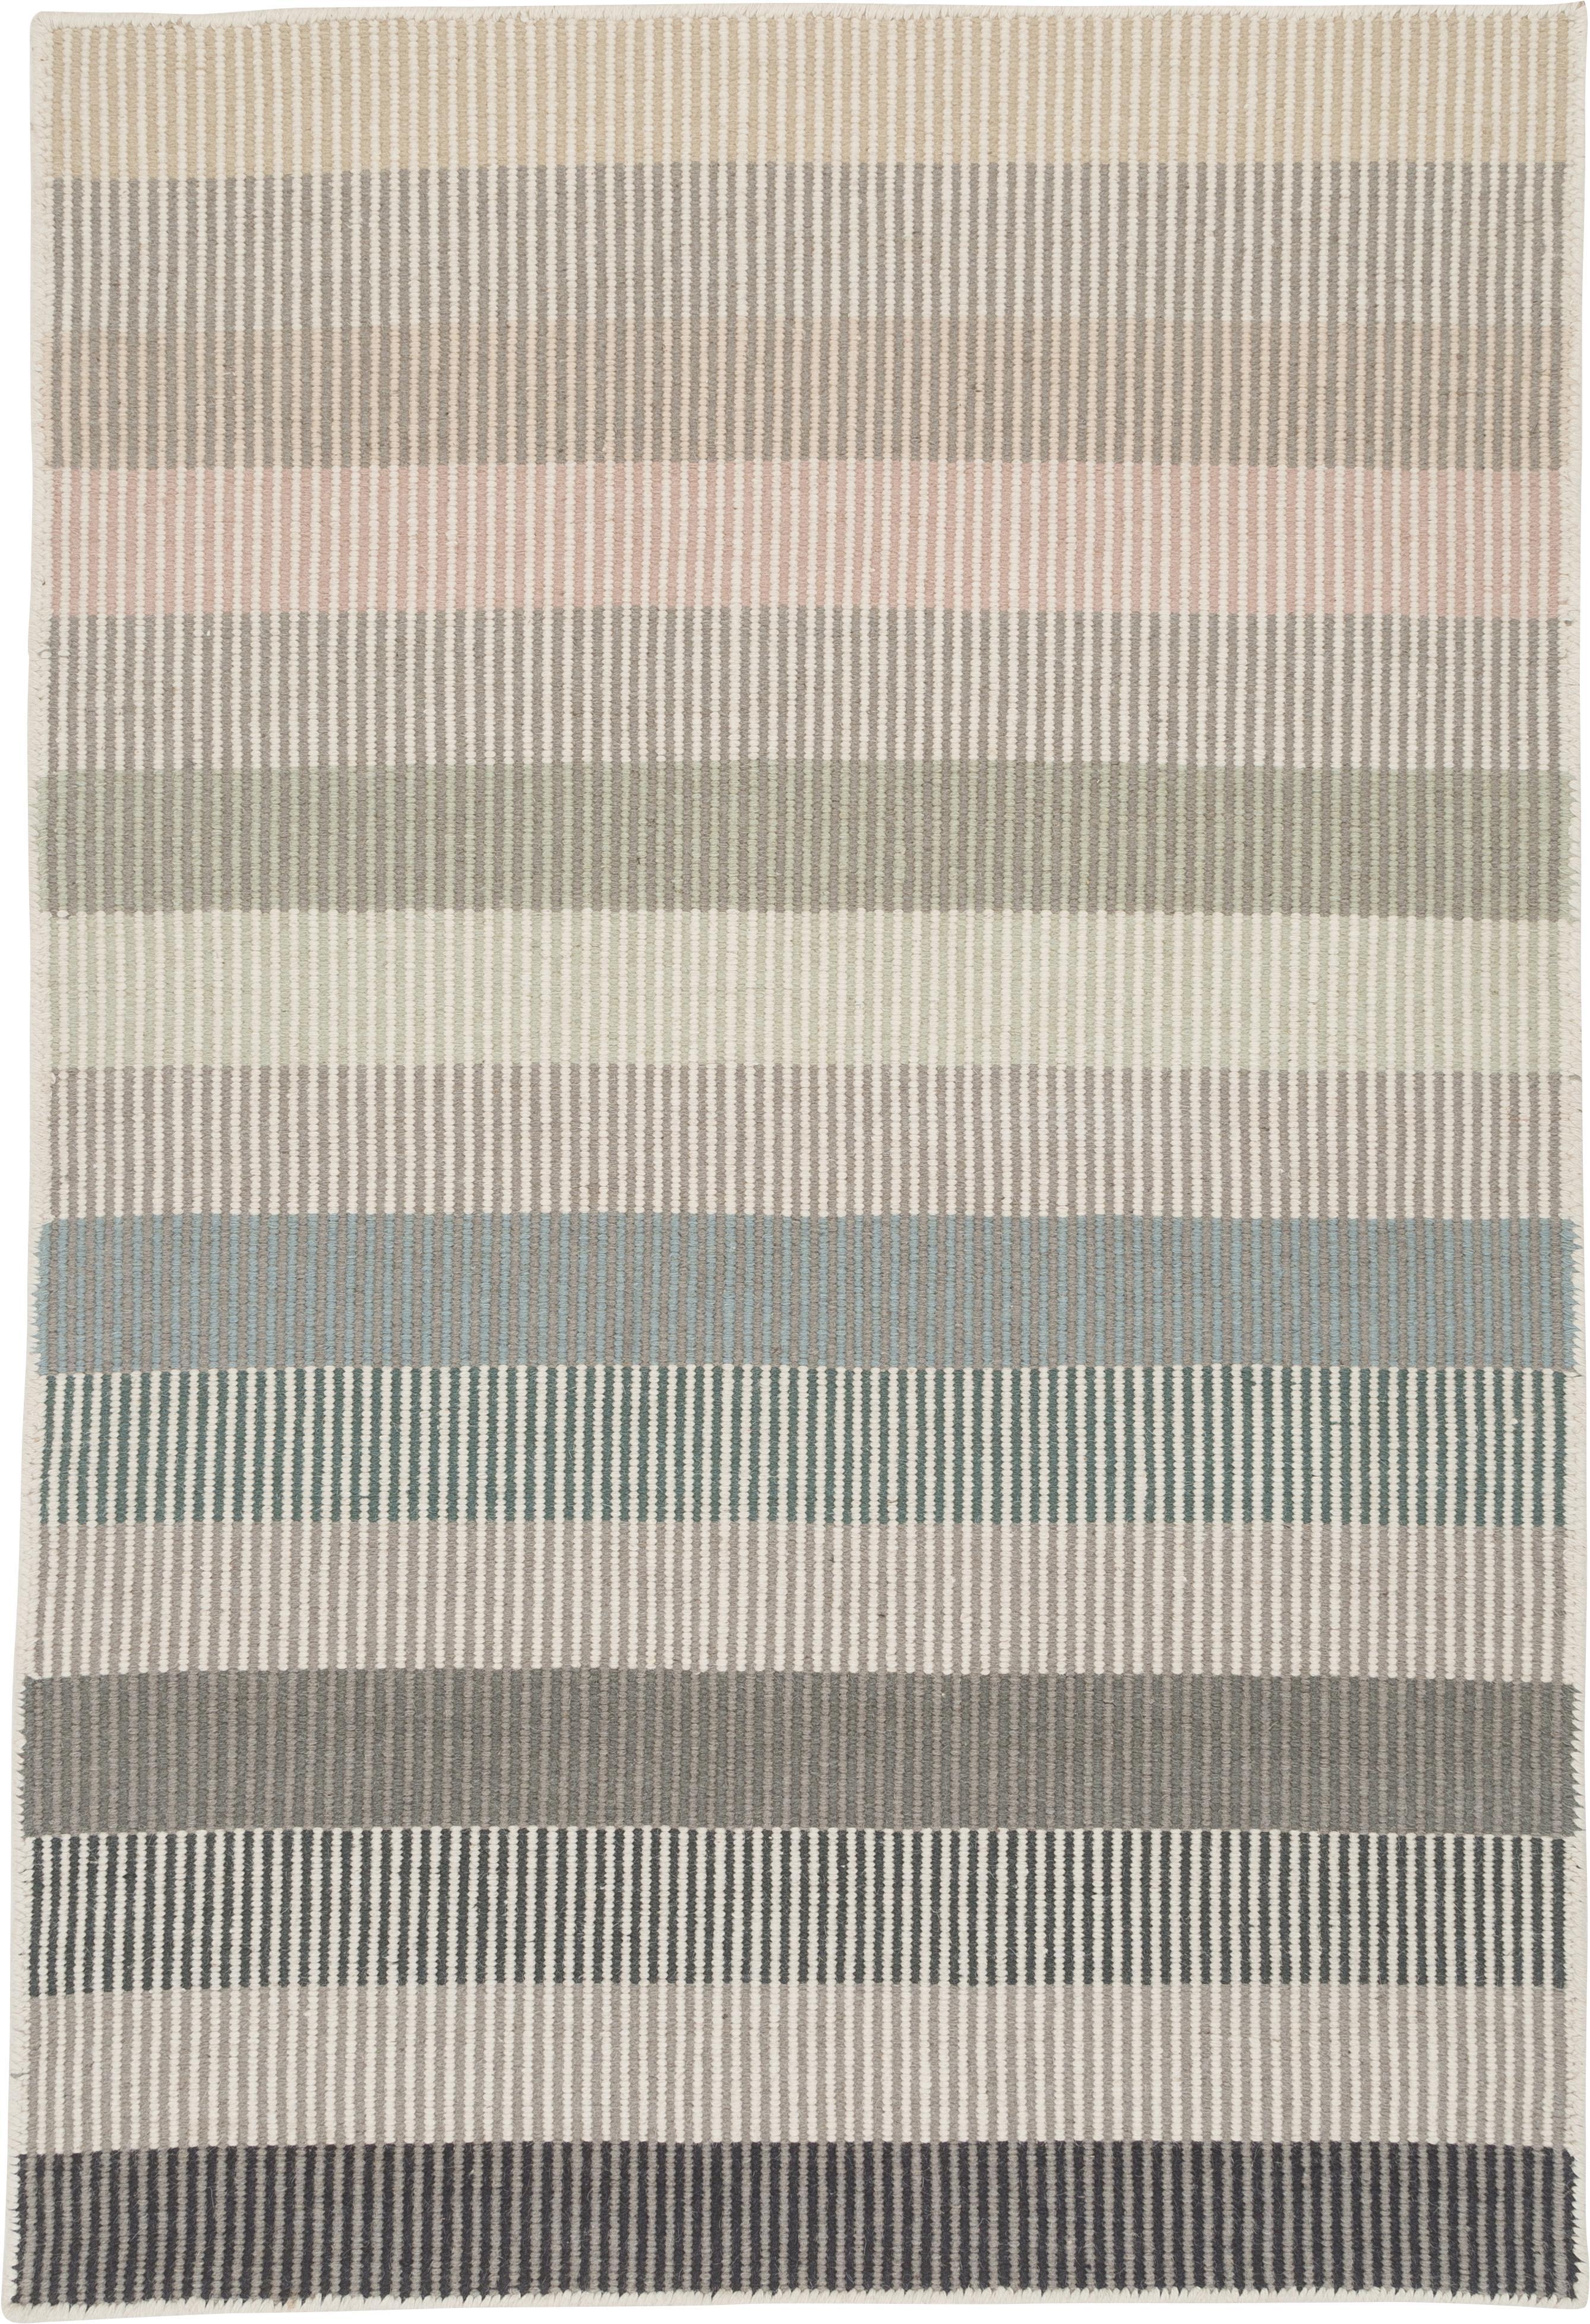 Alfombra artesanal de lana Devise, Multicolor, An 140 x L 200 cm (Tamaño S)